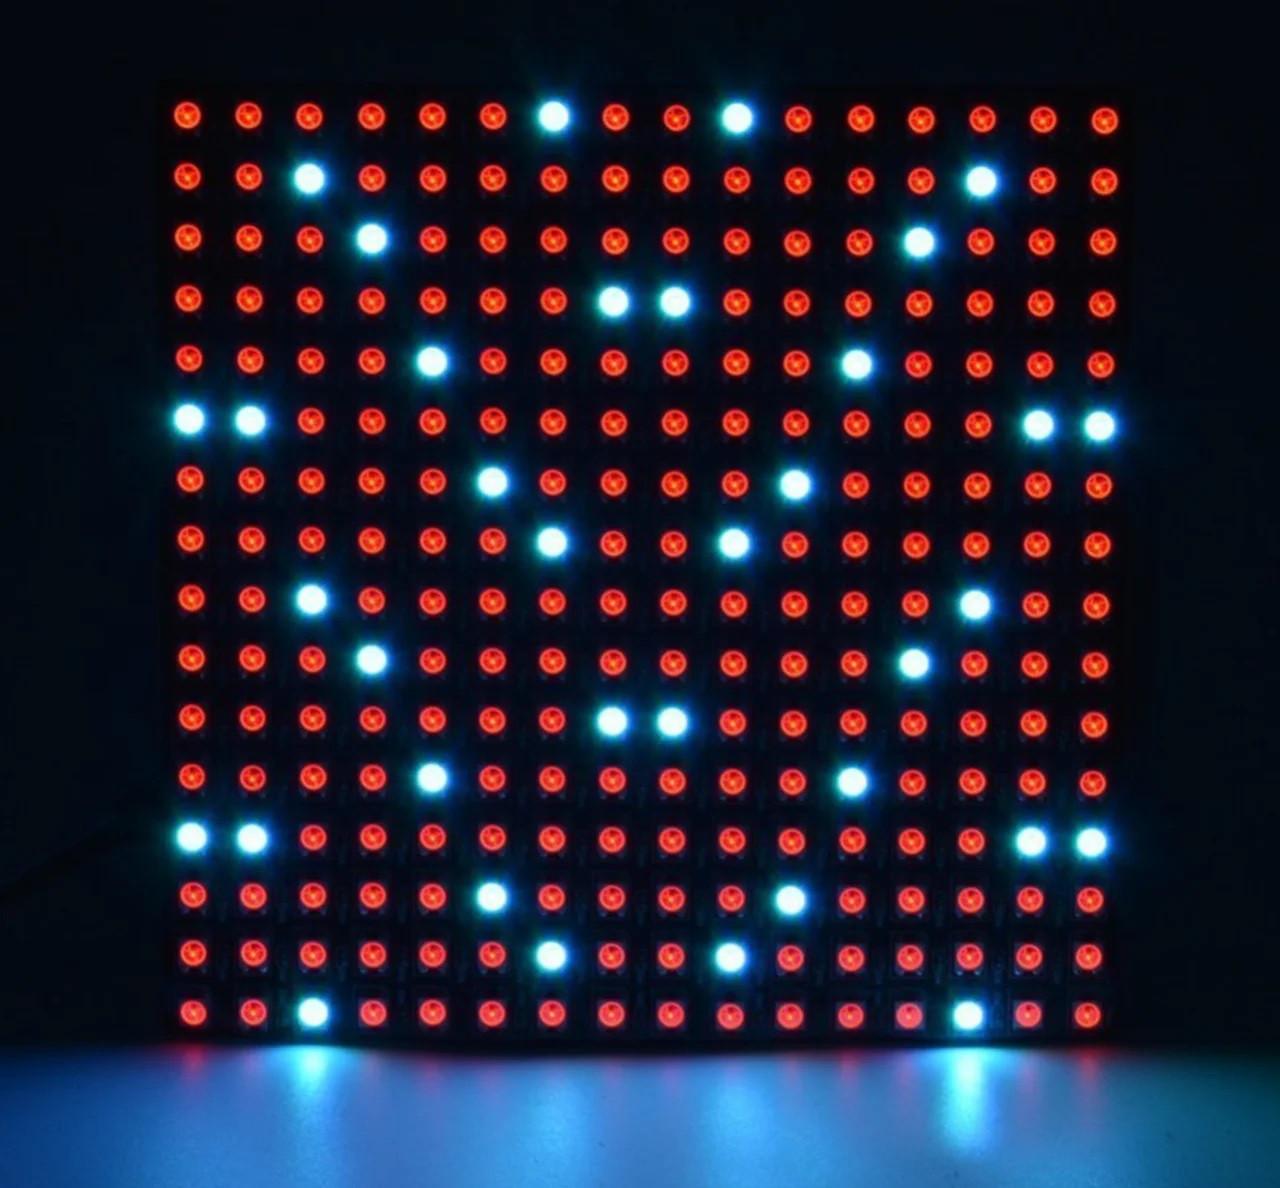 LED гибкая матрица WS2812B на светодиодах 5050, 16х16(256LED), 5В